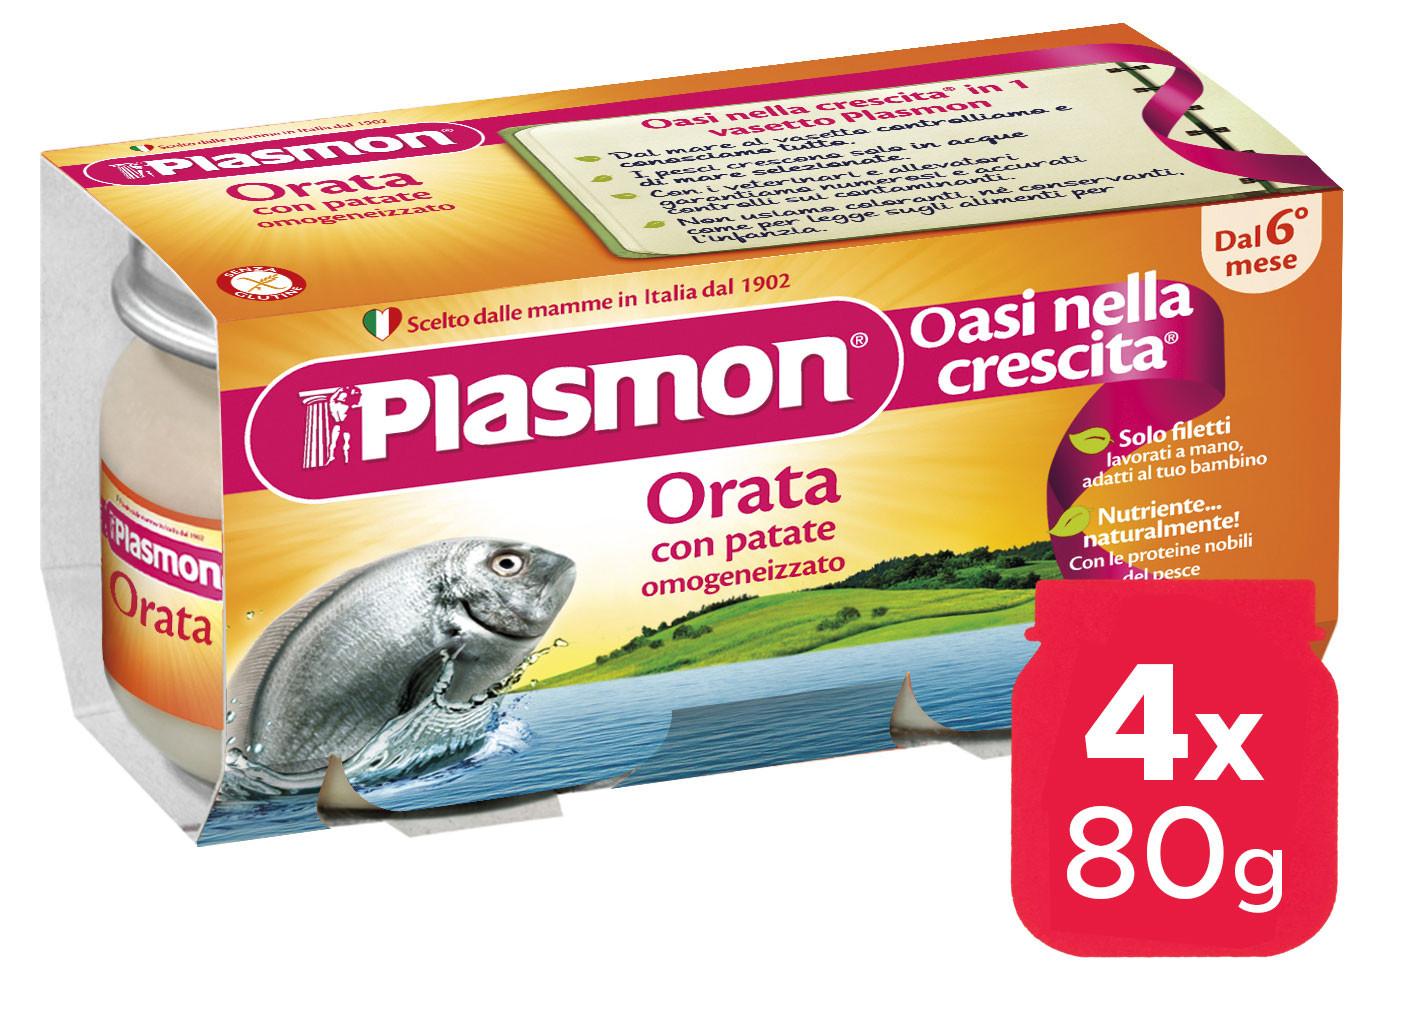 Omogeneizzato Orata Plasmon - 4 x 80 g